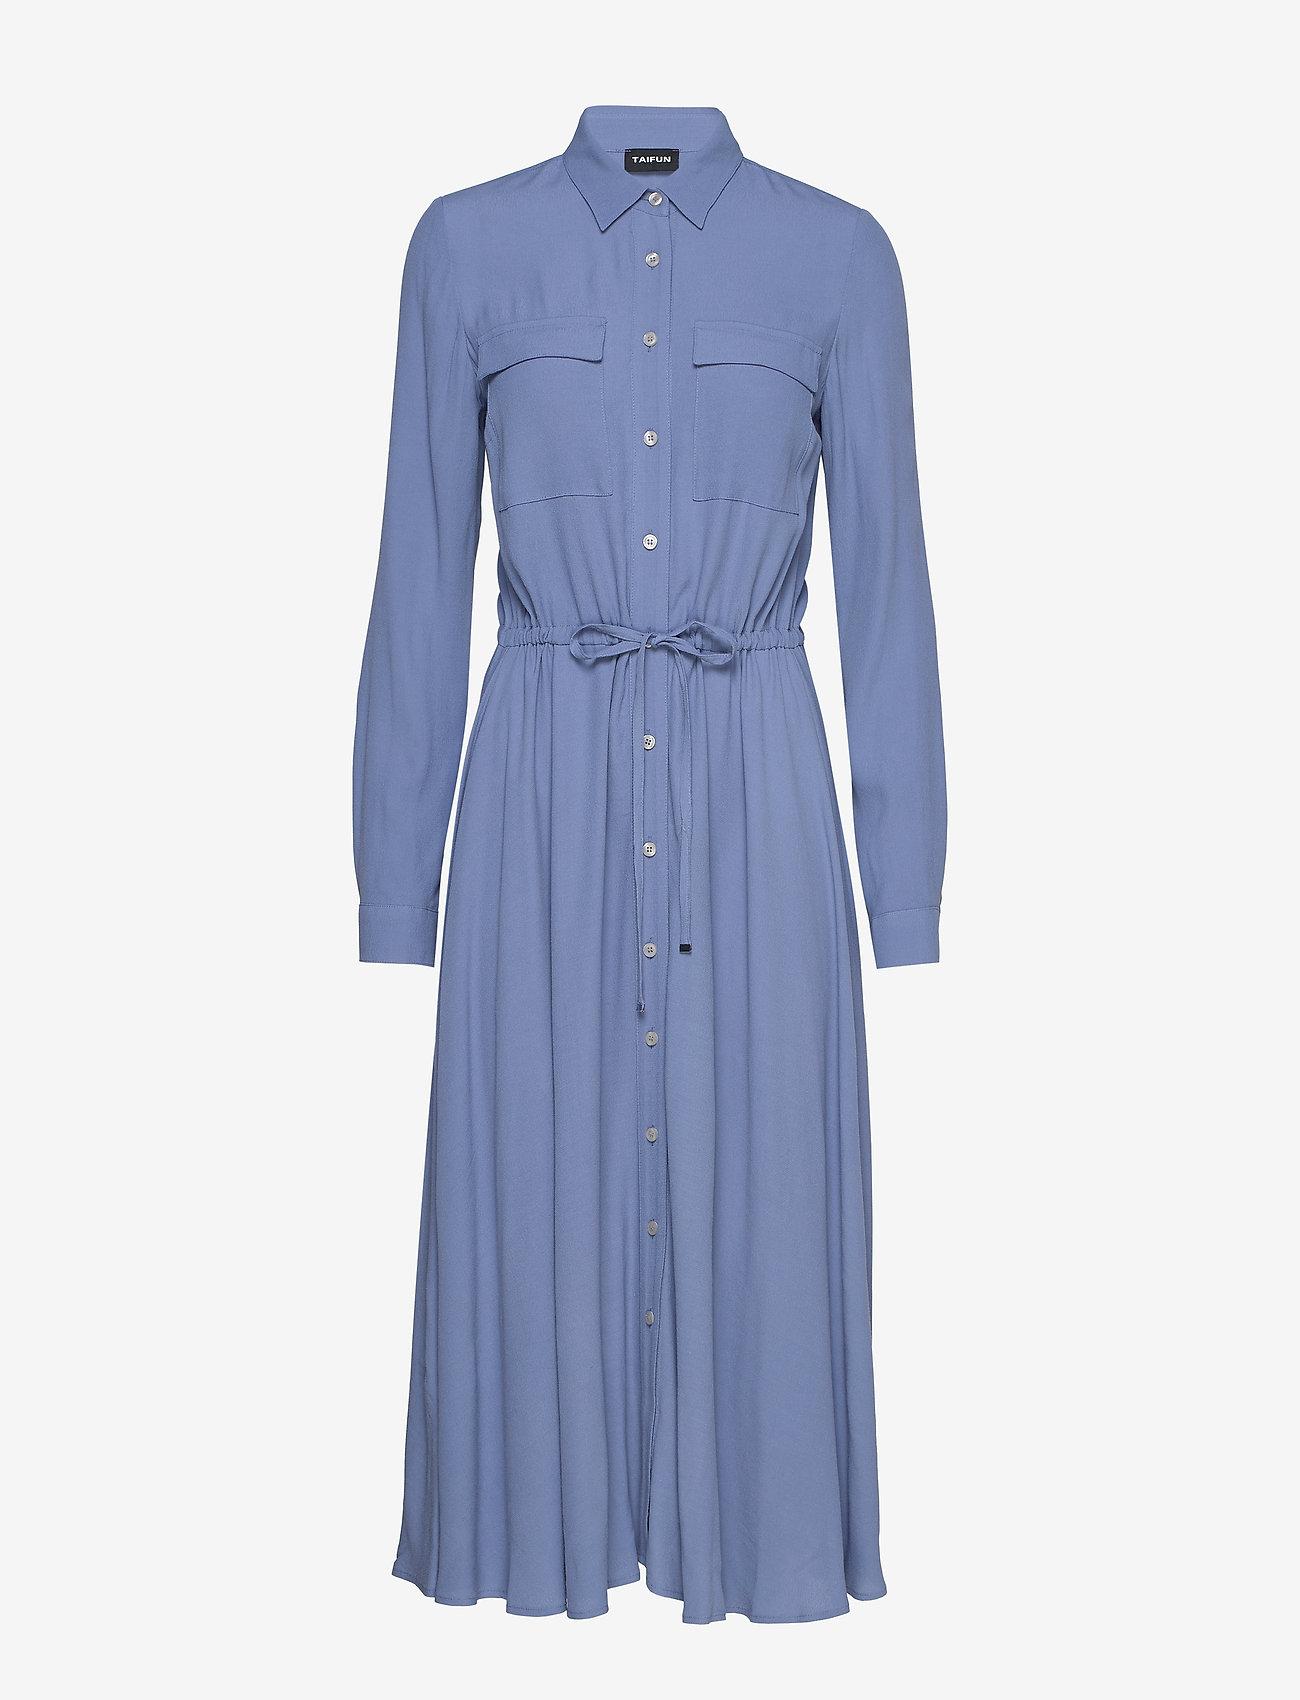 Taifun - DRESS WOVEN FABRIC - skjortklänningar - cornflower blue - 0